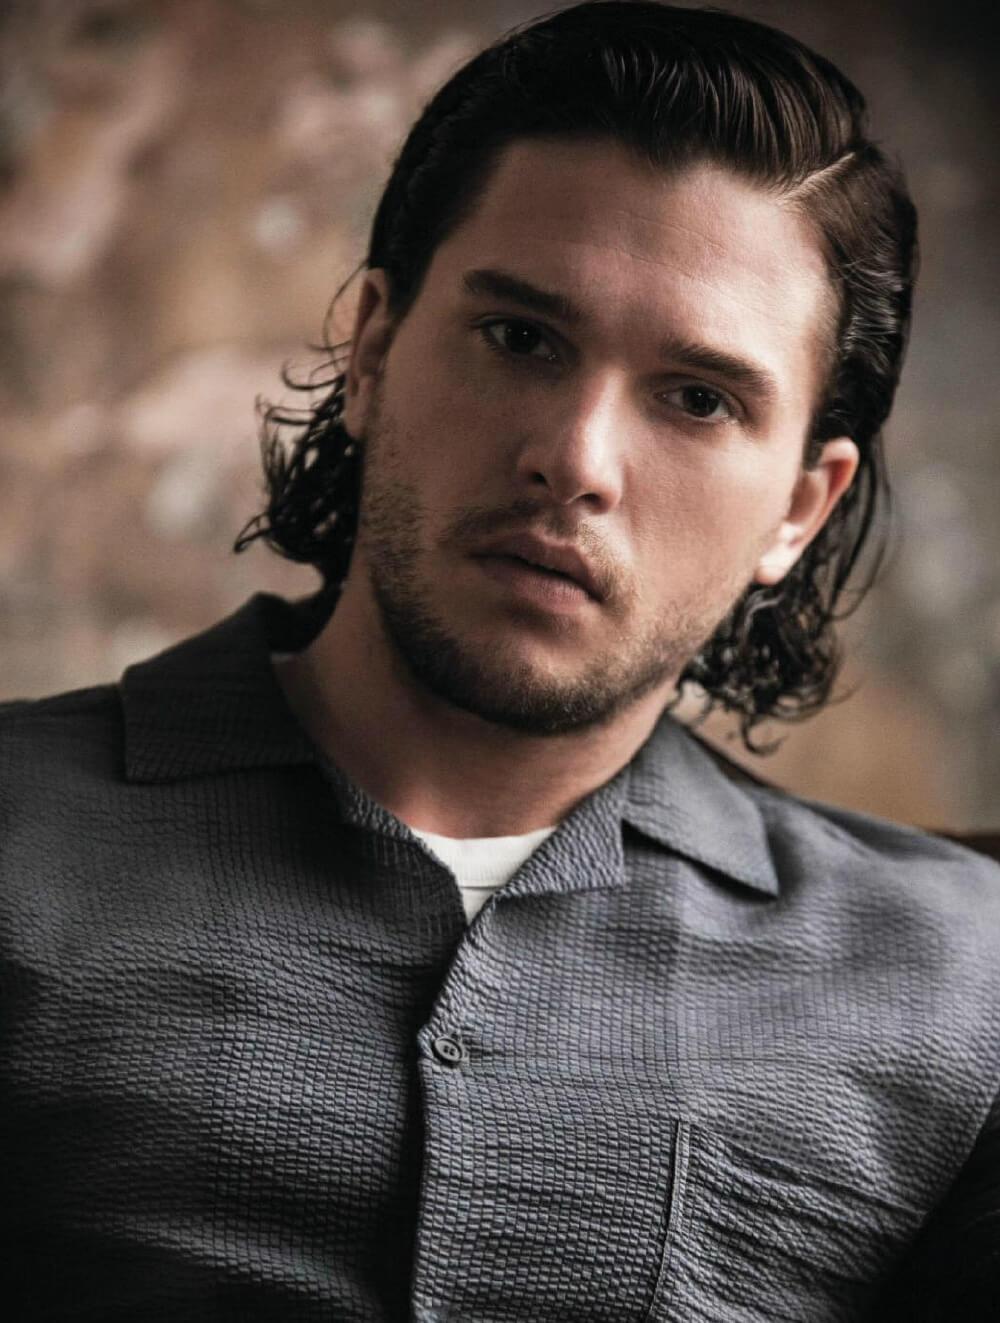 Il bellissimo Kit Harington protagonista di Game Of Thrones